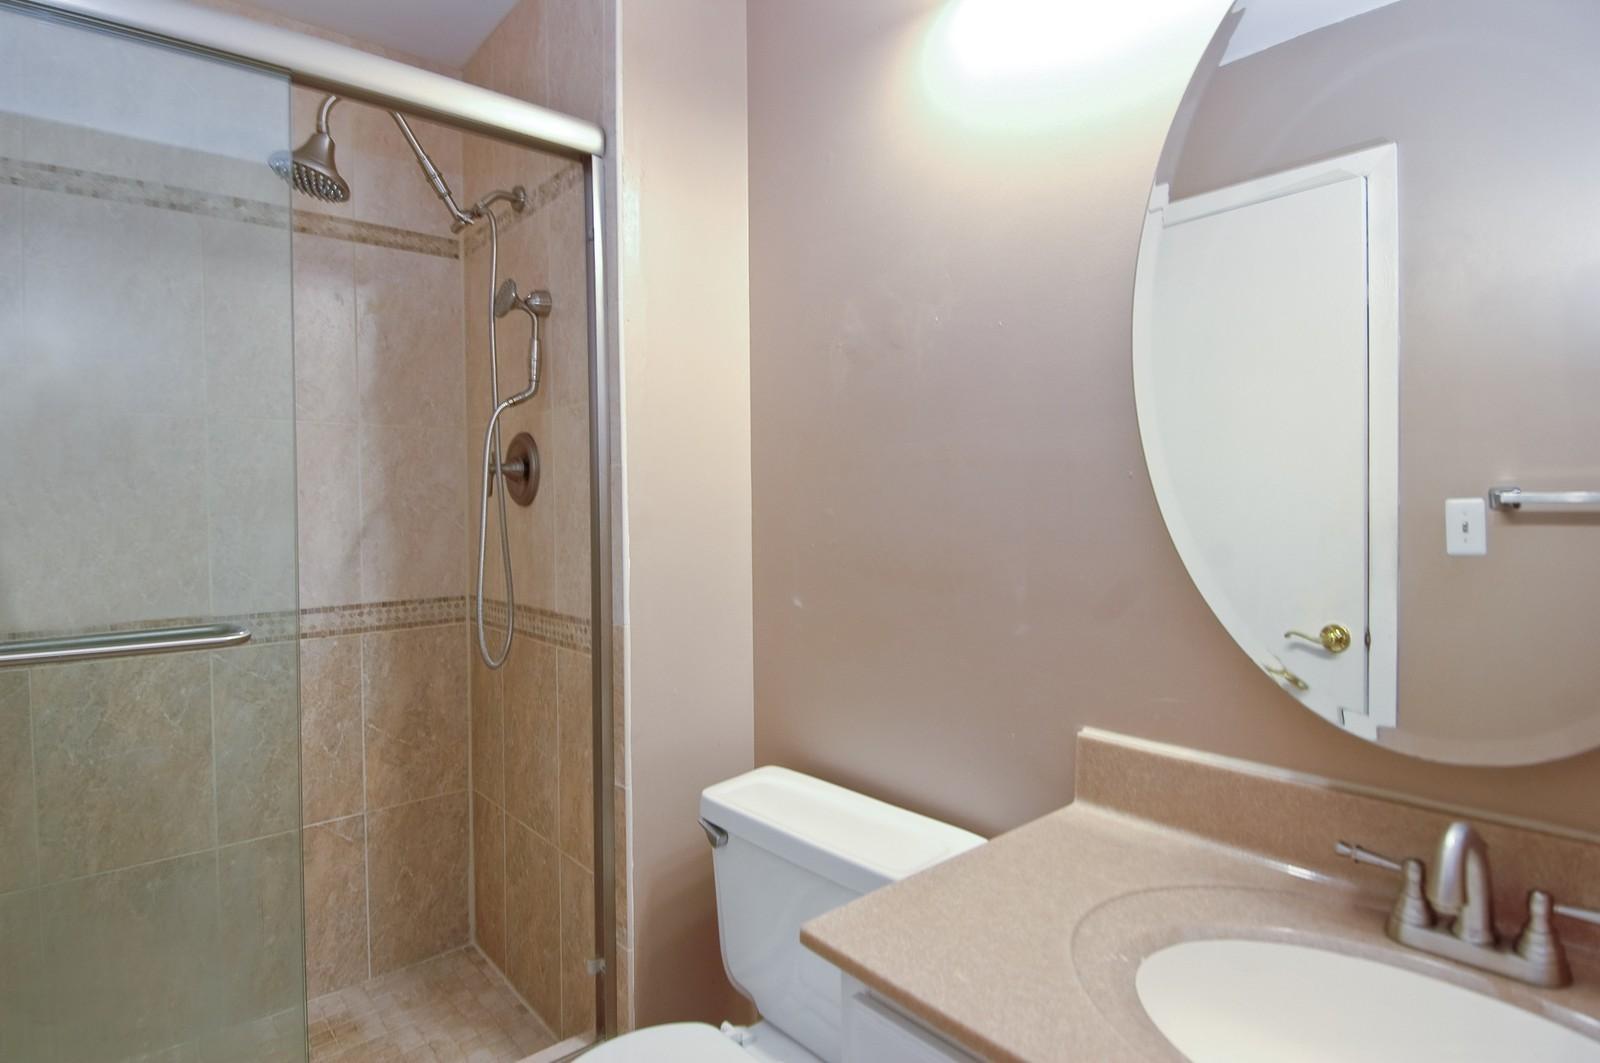 Real Estate Photography - 756 Harvest Dr, Lake Zurich, IL, 60047 - Master Bathroom